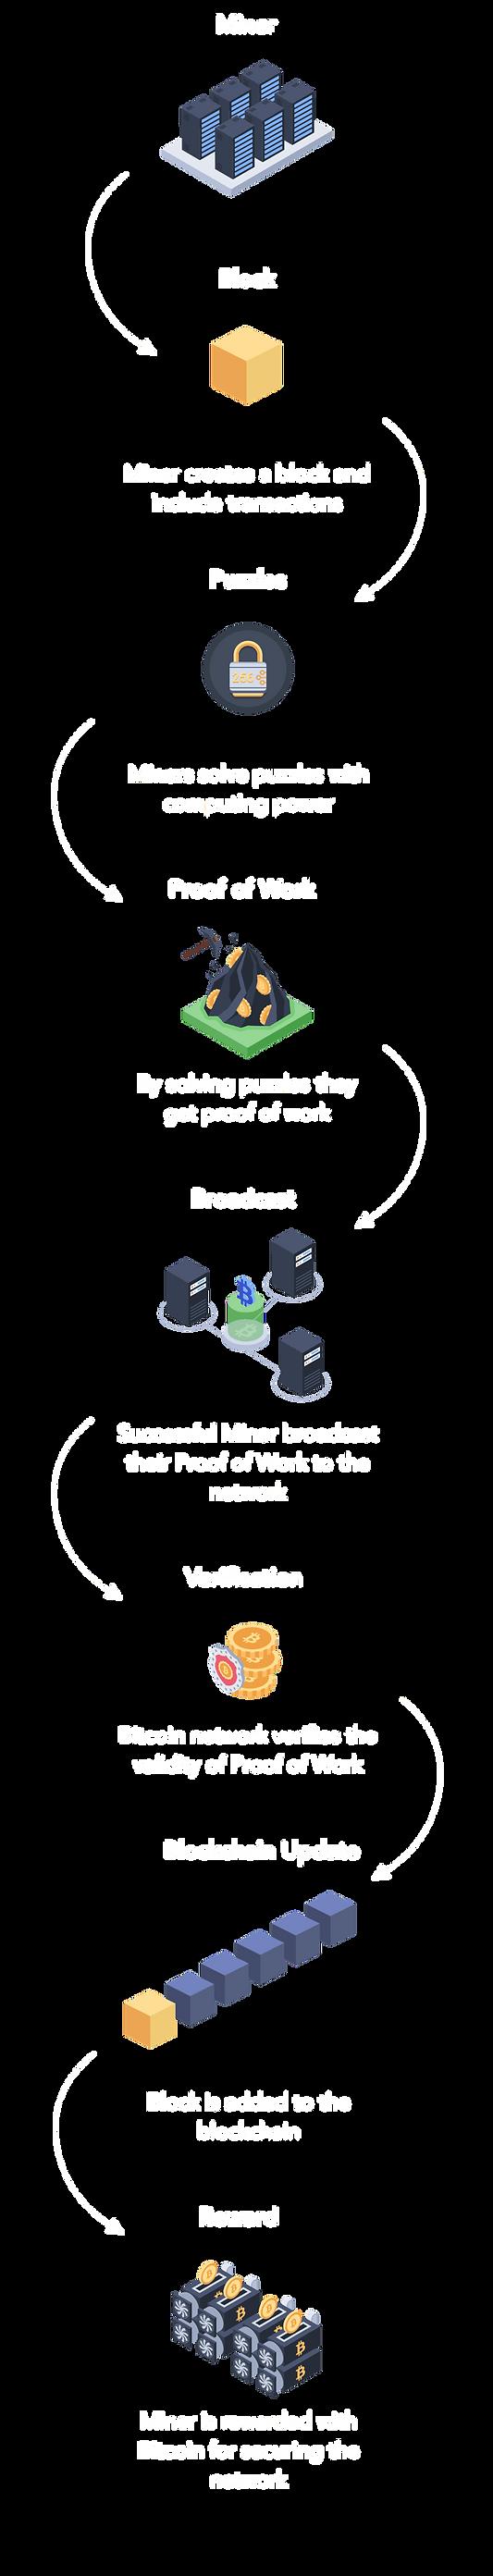 EN-Mobile-mining.png